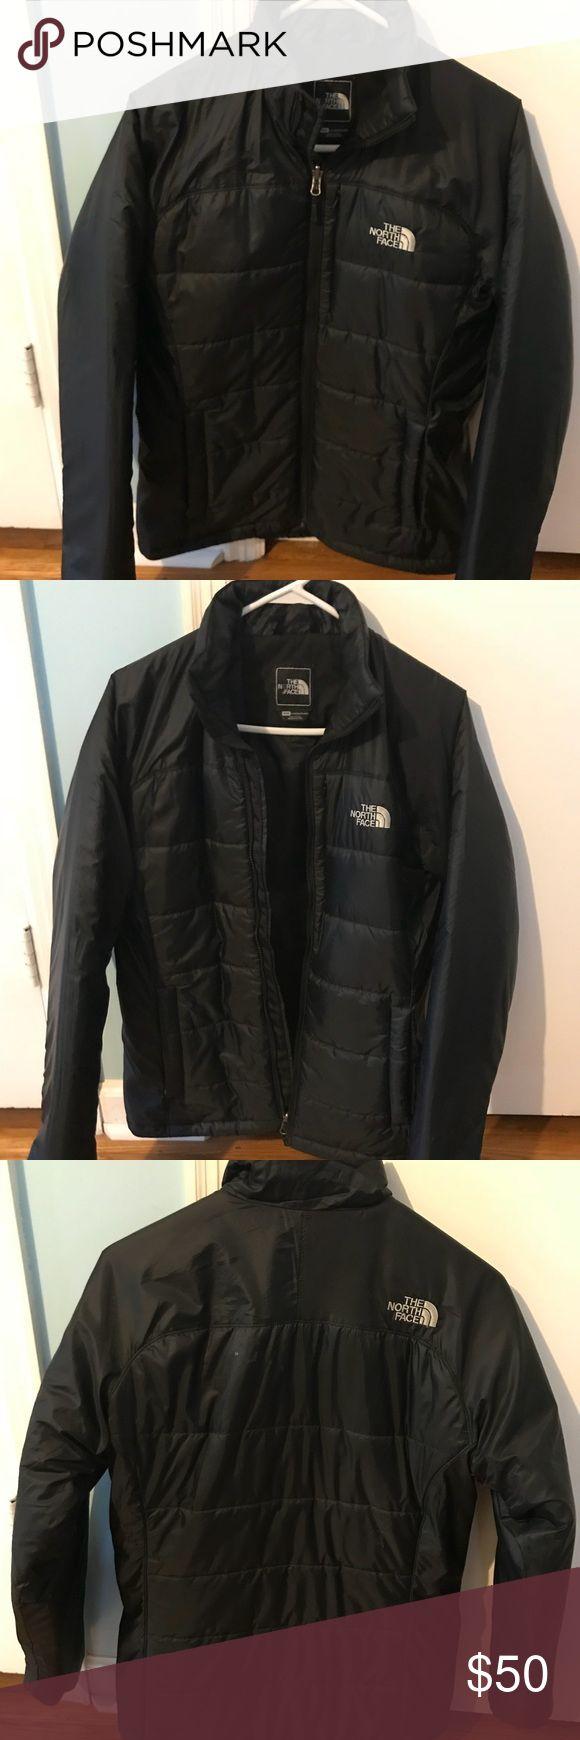 Selling this Women's Black North Face Jacket on Poshmark! My username is: mdhorlander00. #shopmycloset #poshmark #fashion #shopping #style #forsale #North Face #Jackets & Blazers